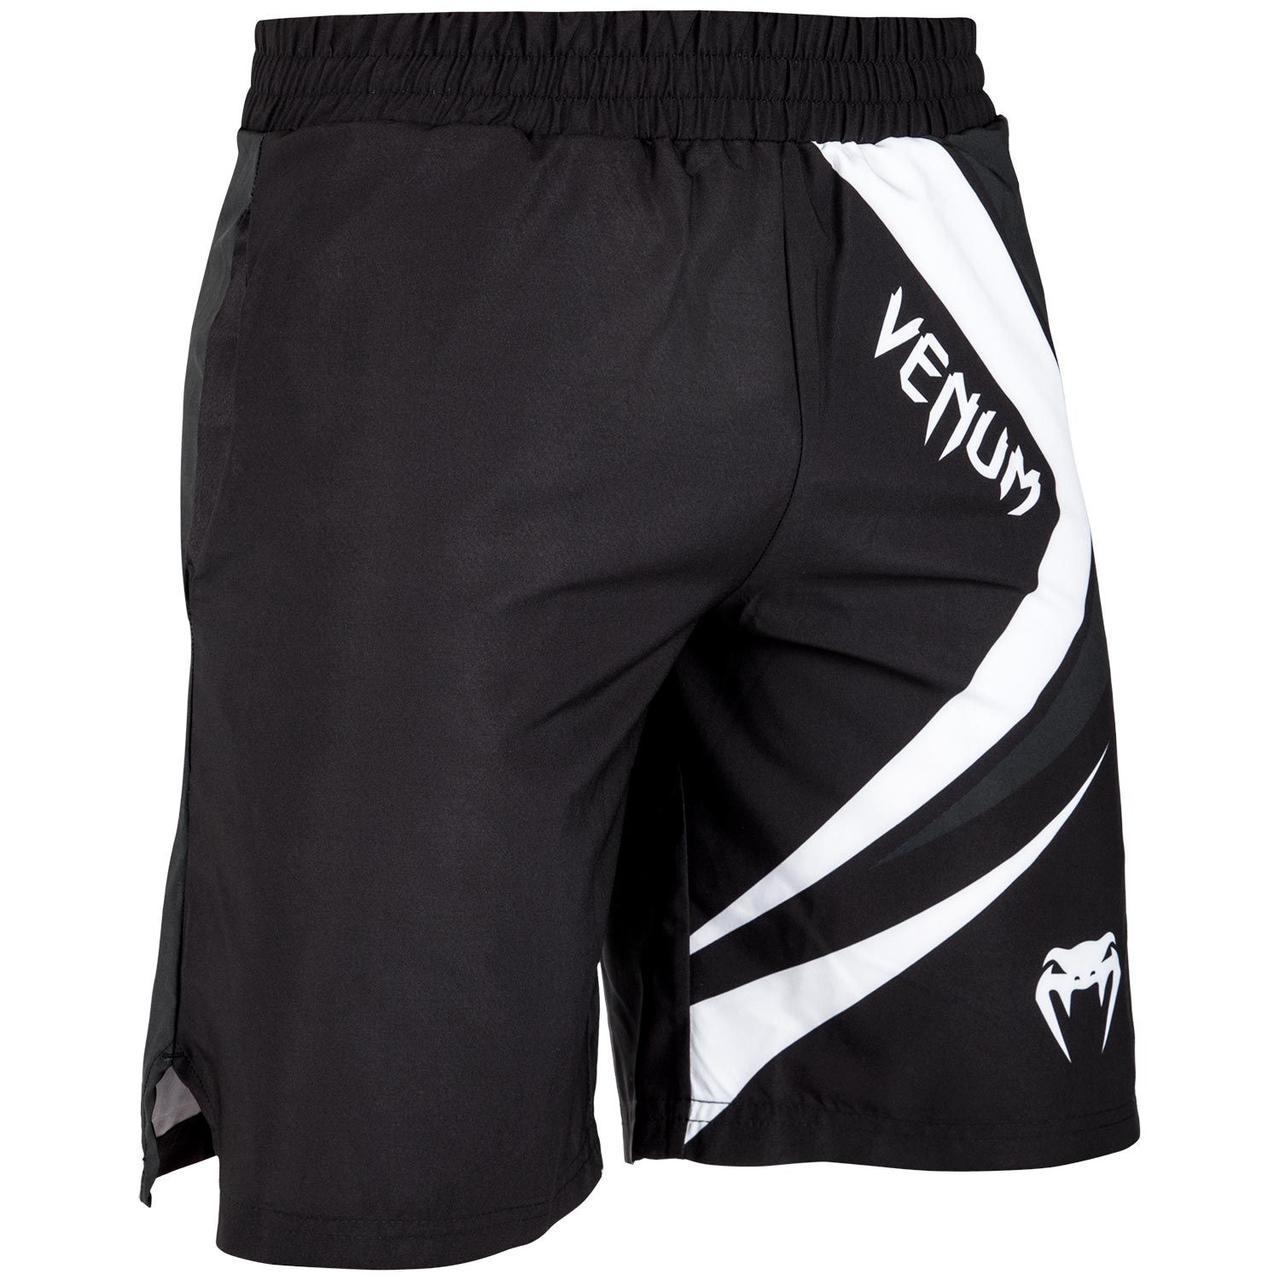 Шорты Venum Contender 4.0 Training Shorts - Black/Grey-White